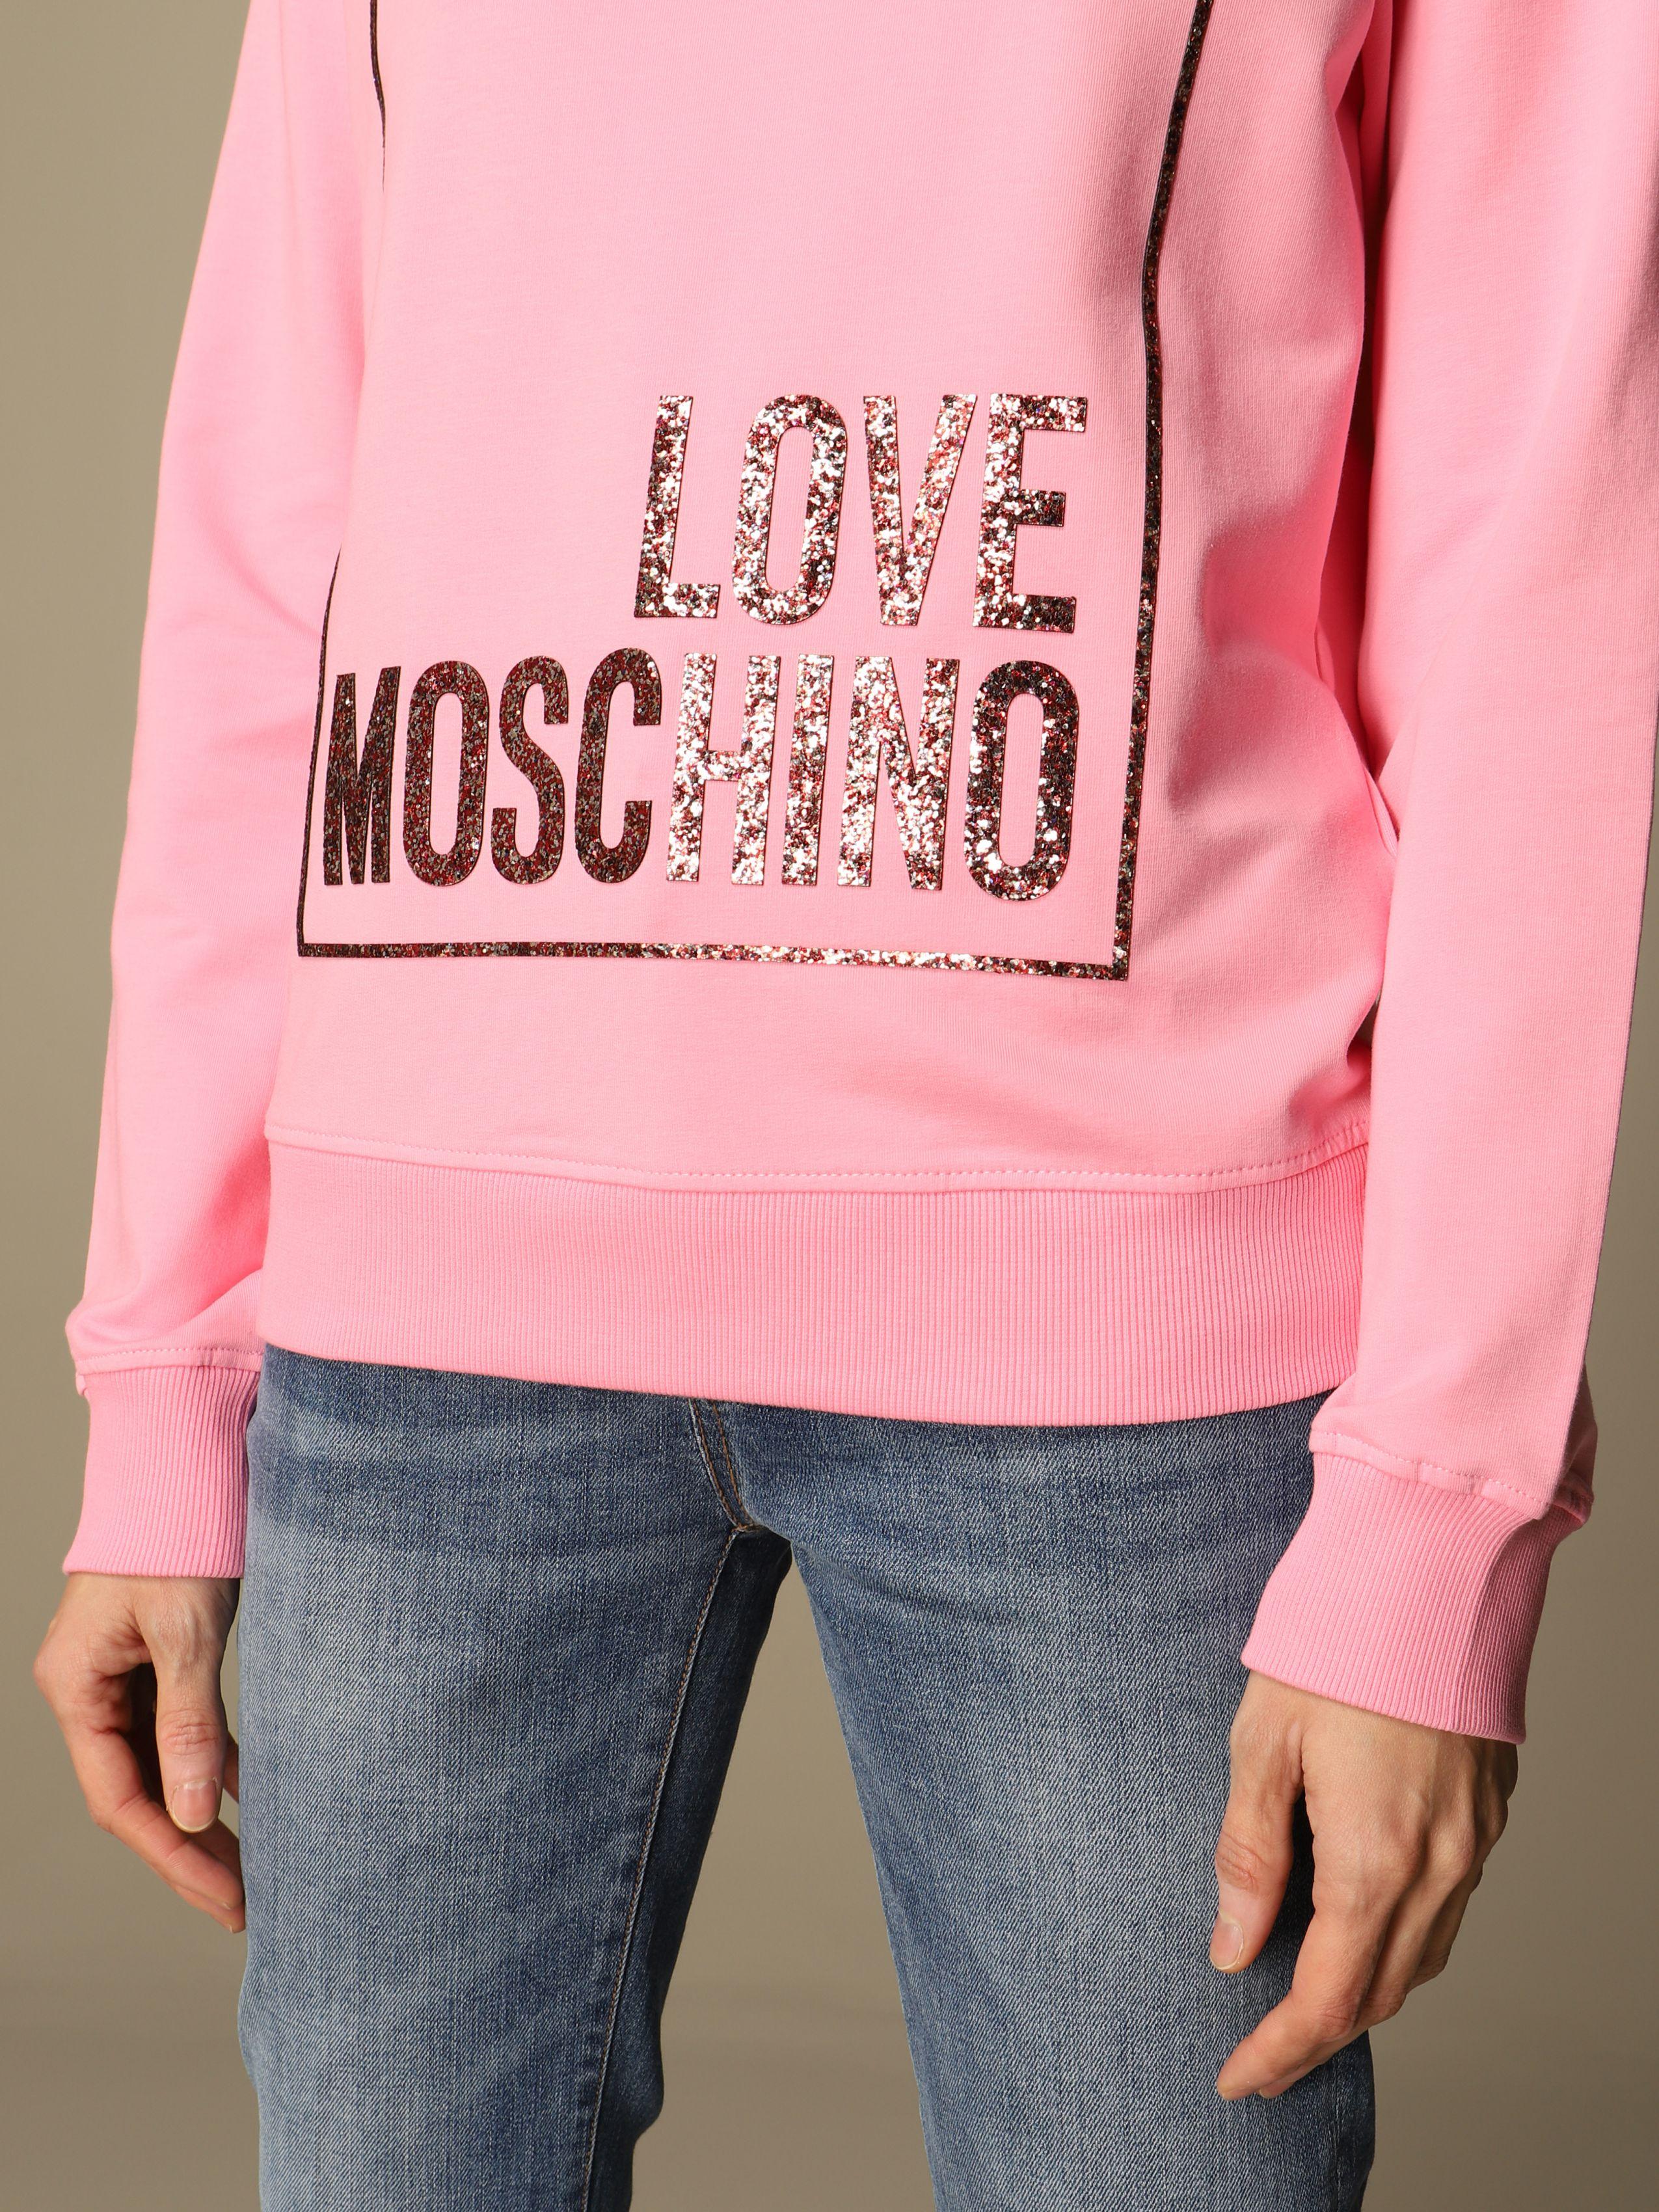 felpa glitter logo box love moschino LOVE MOSCHINO | Felpe | W6302 20 E2180N35